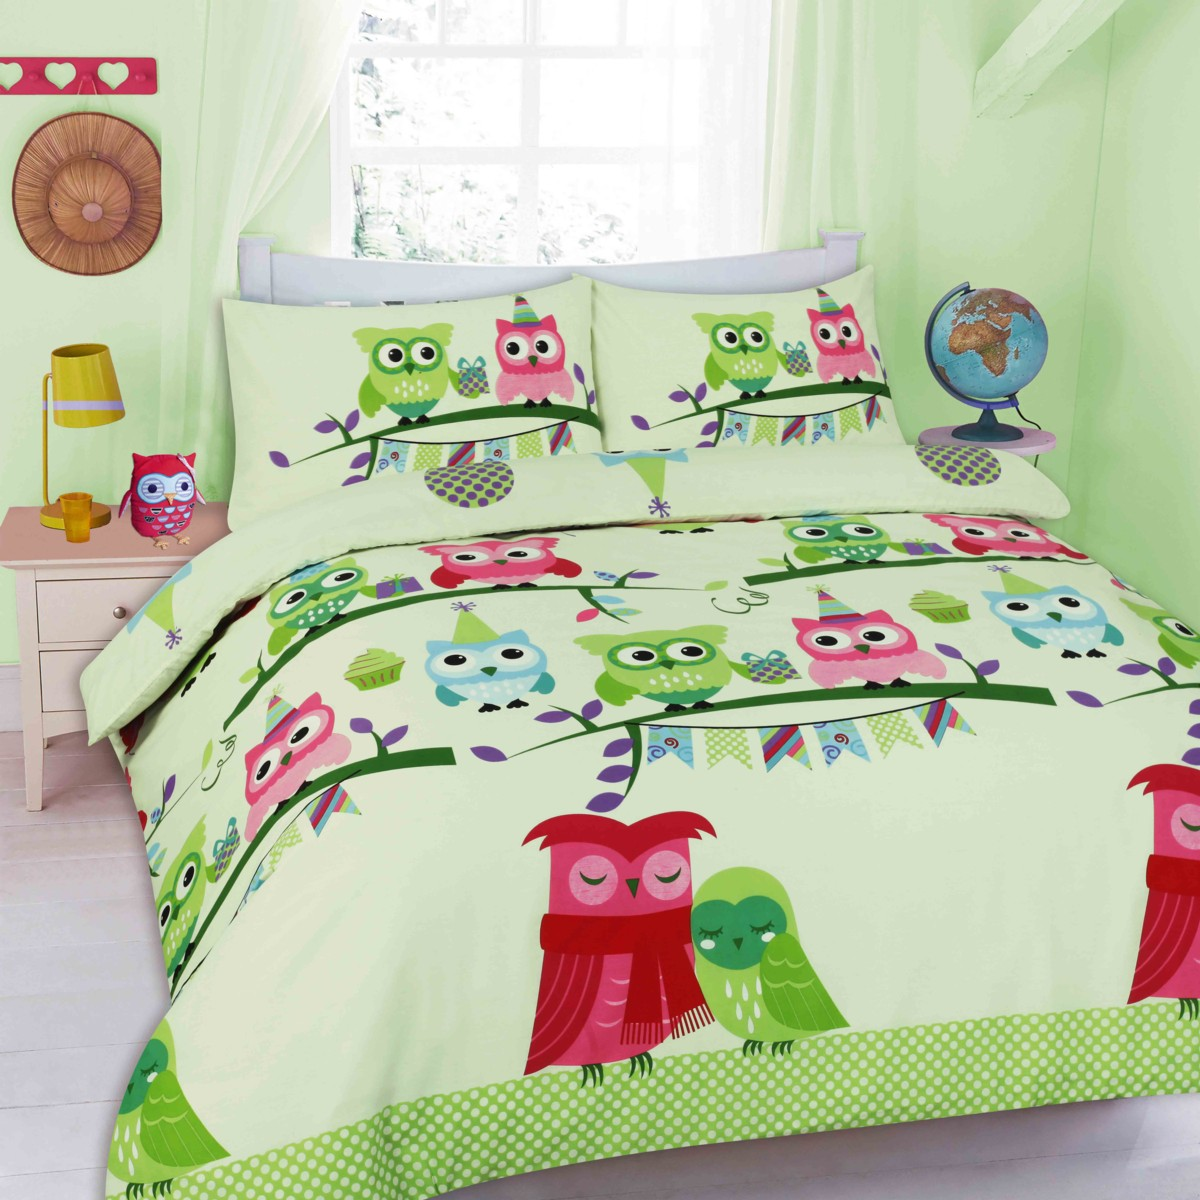 Cute Owls Floral Printed Duvet Cover Bedding Set eBay